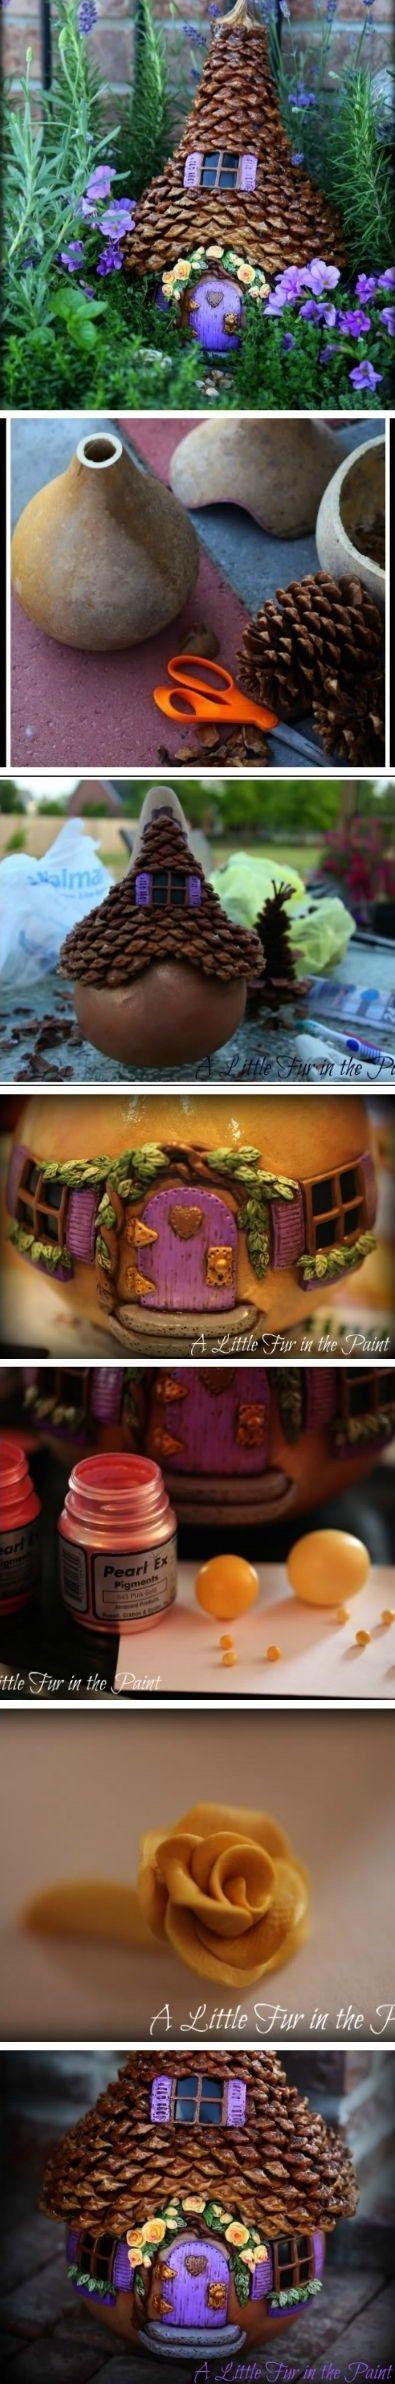 77 best Fairy Houses images on Pinterest   Fairies garden, Fairy ...